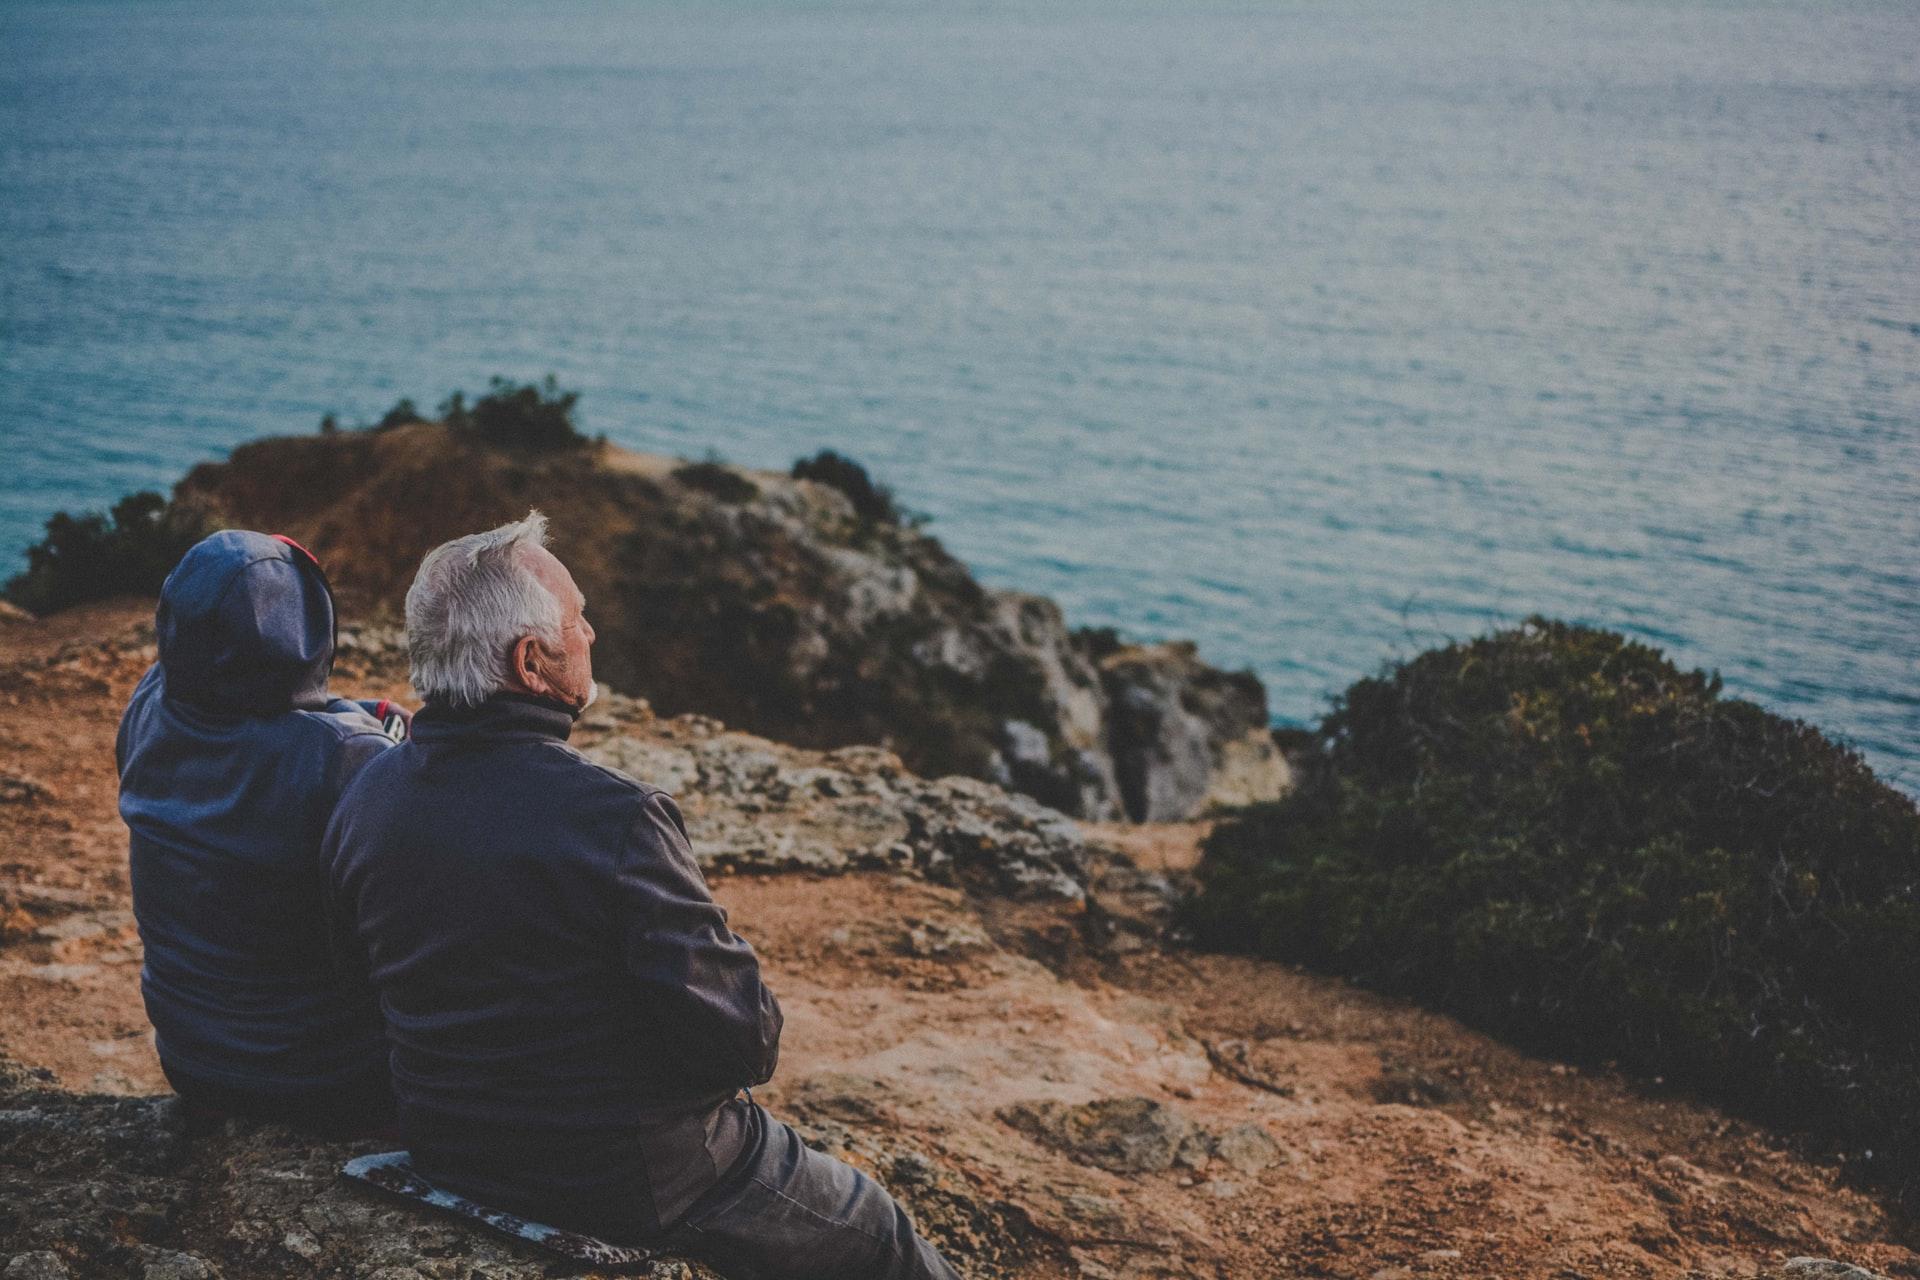 More Gray Divorces Puts Spotlight on Dividing Retirement Funds